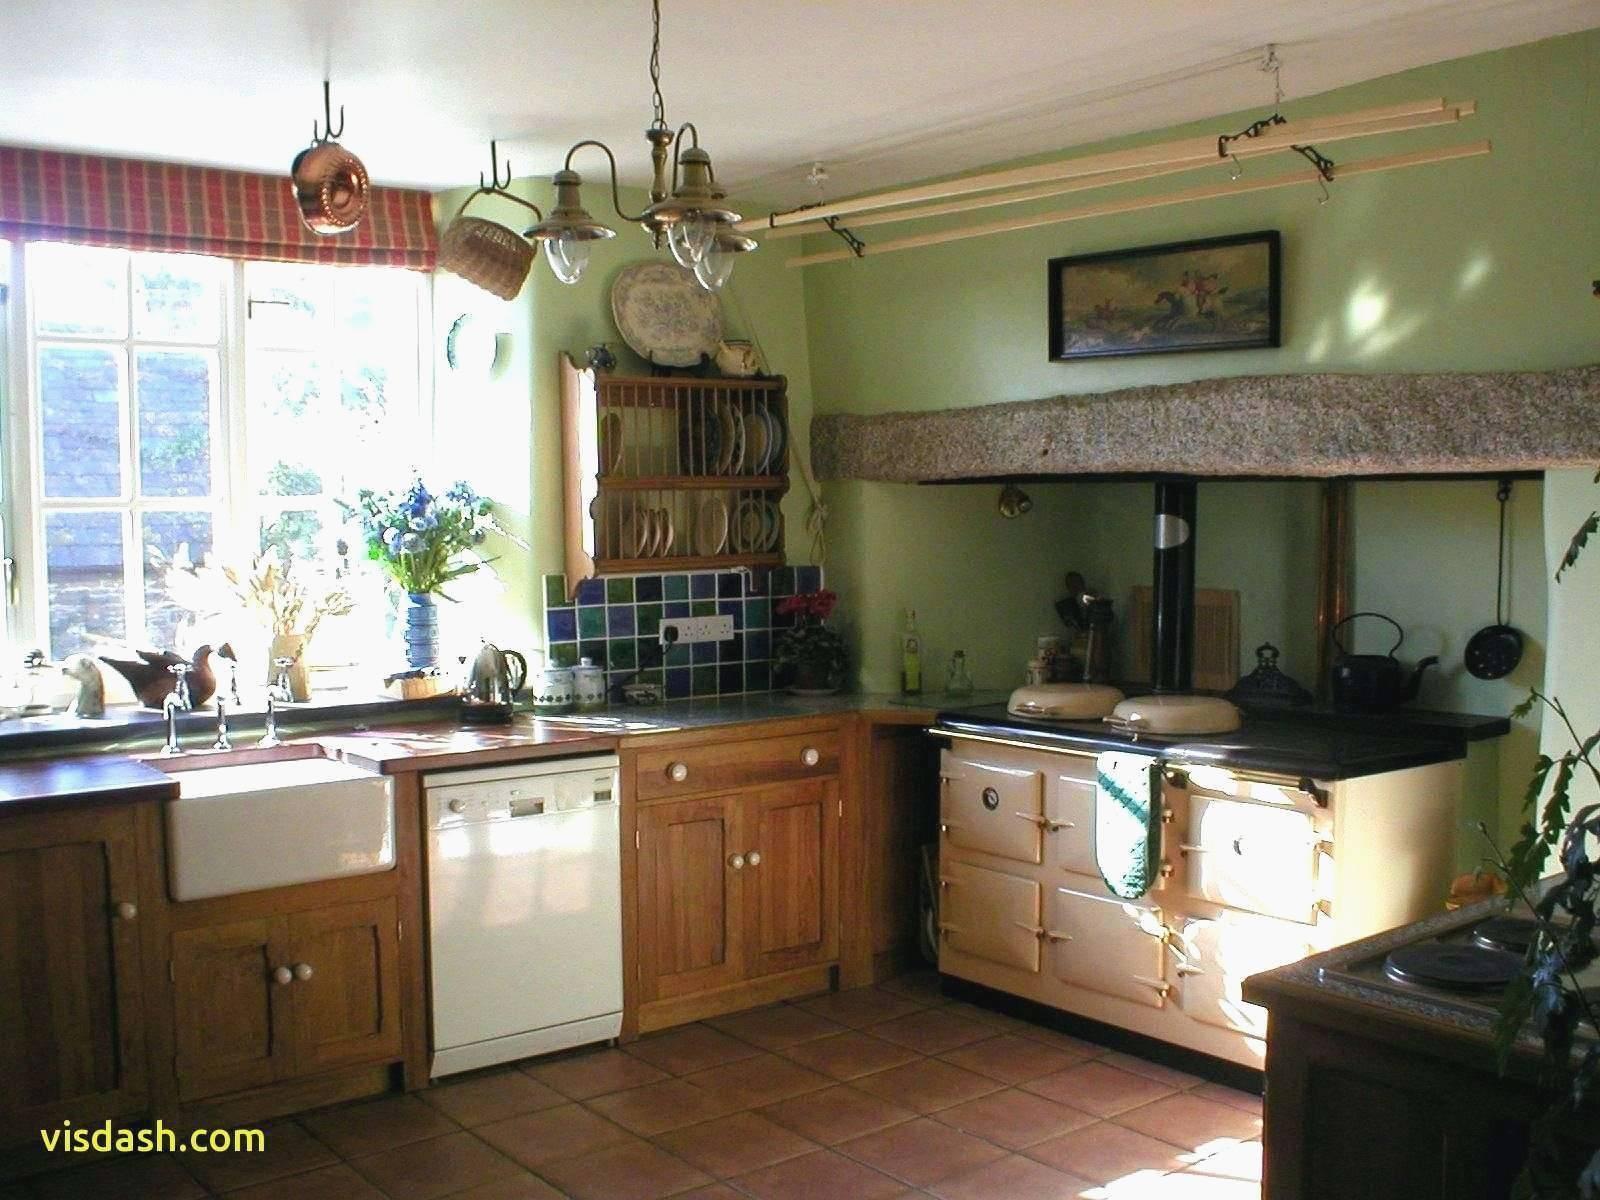 farmhouse style dining table awesome farmhouse style dining table best kitchen design farmhouse of farmhouse style dining table